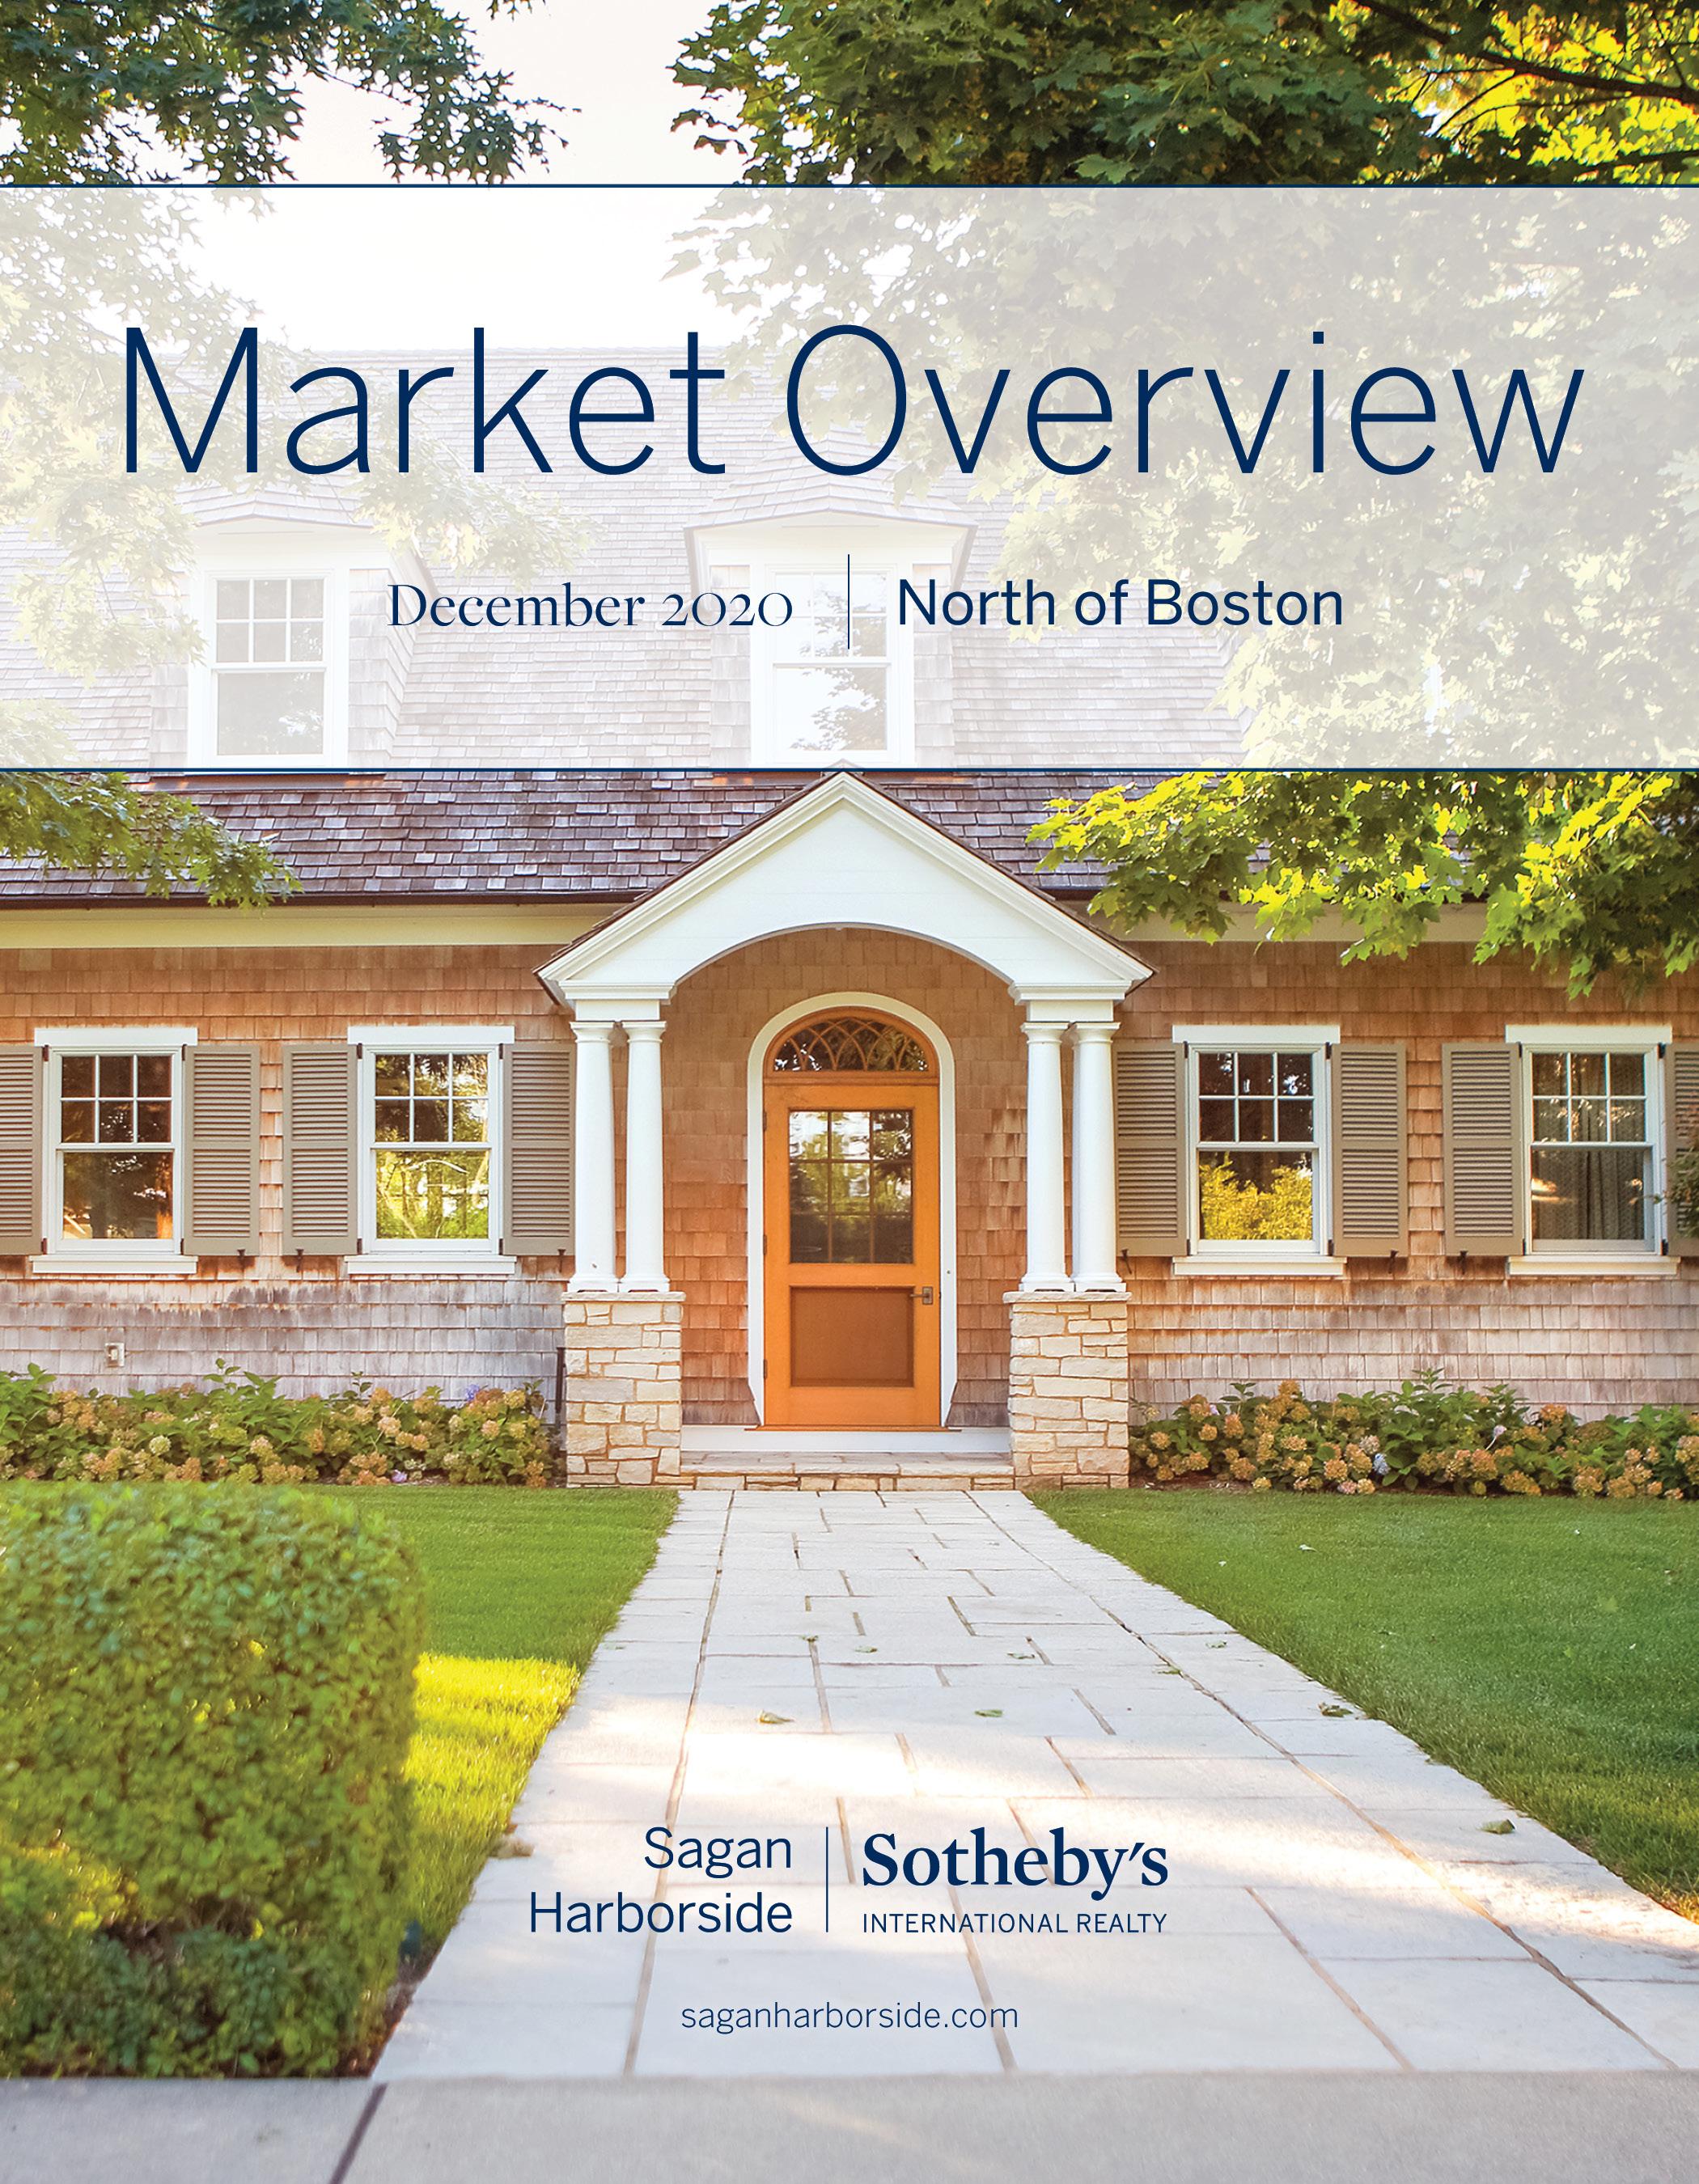 Sagan Harborside | Sotheby's International Realty - 2020 Market Report